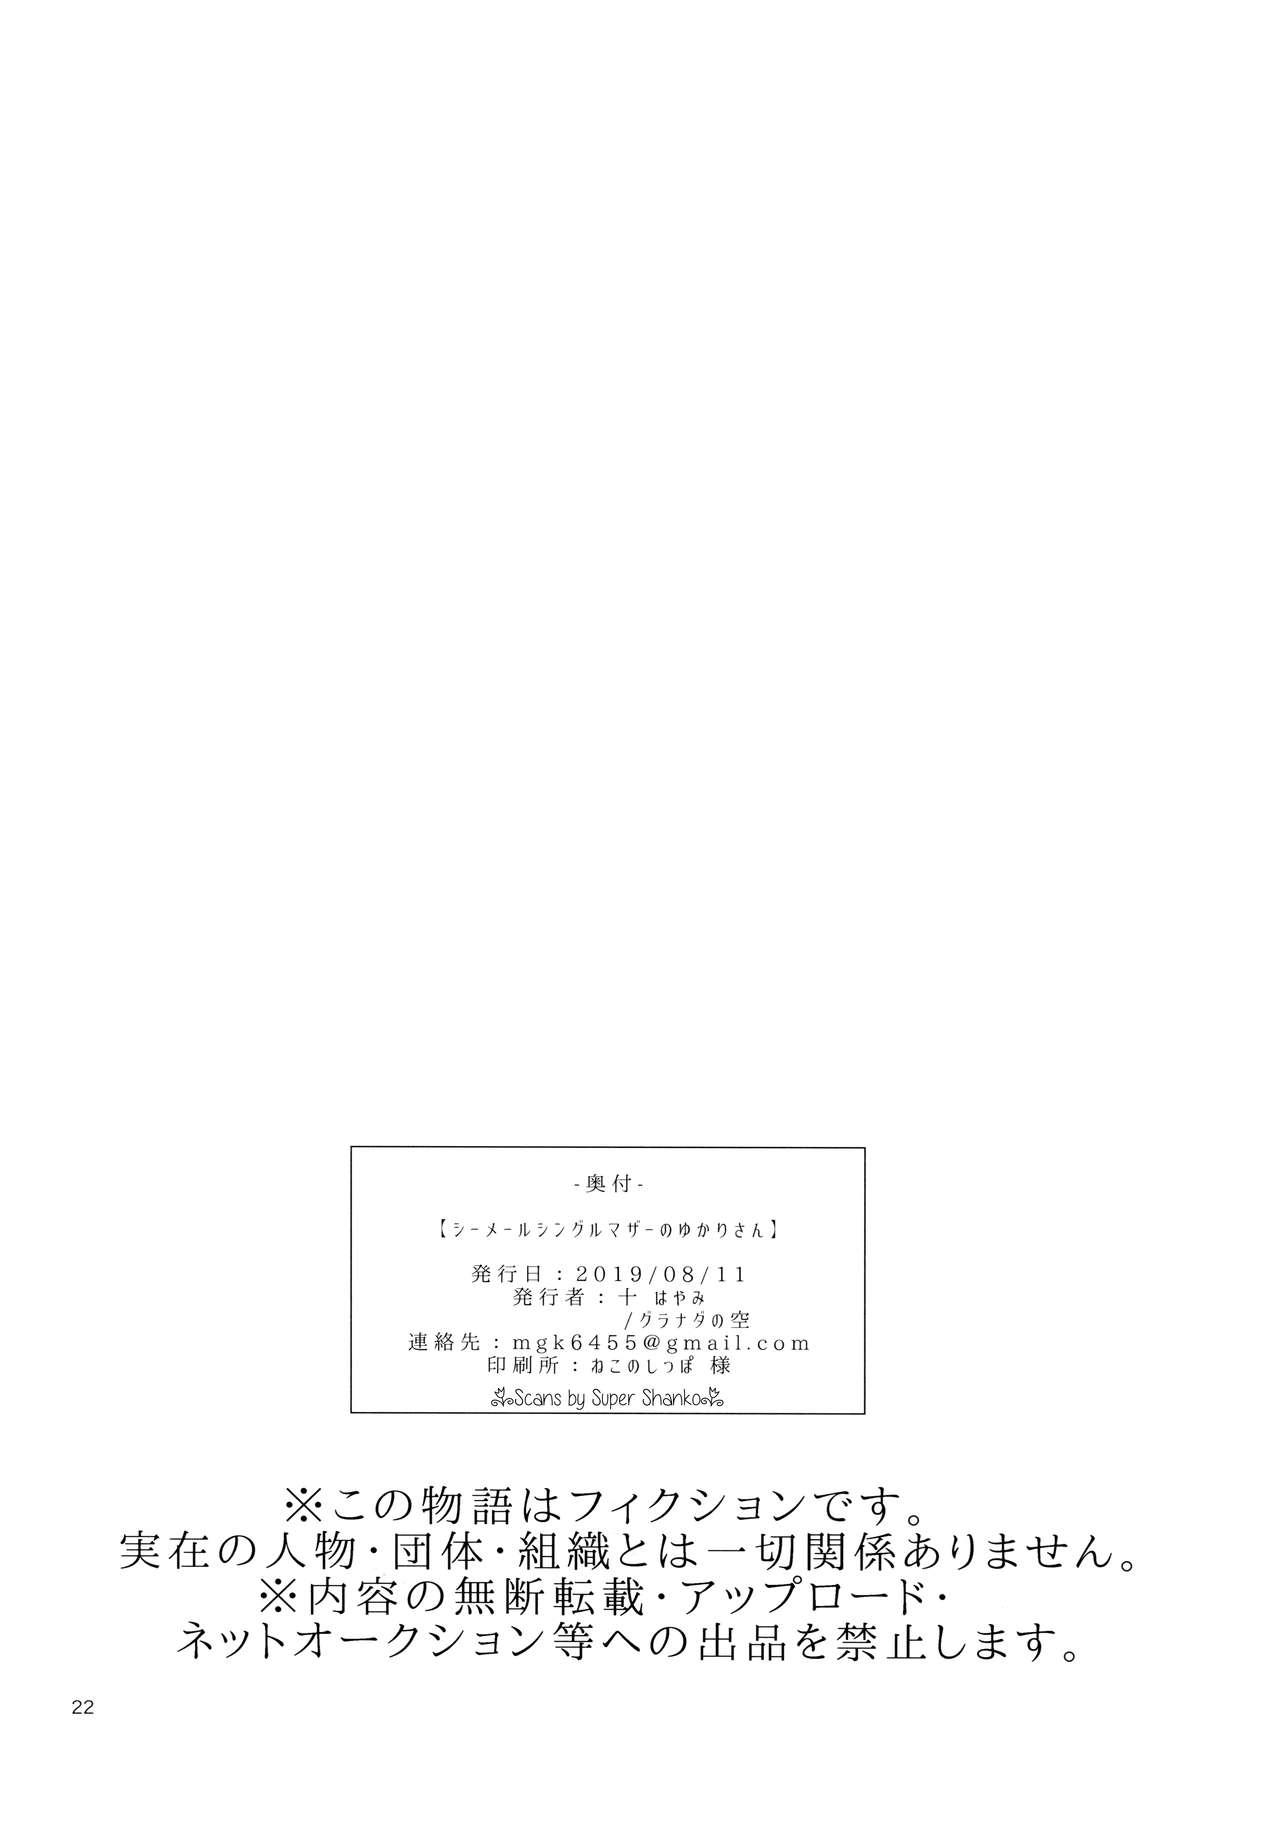 Shemale Single Mother no Yukari-san 20